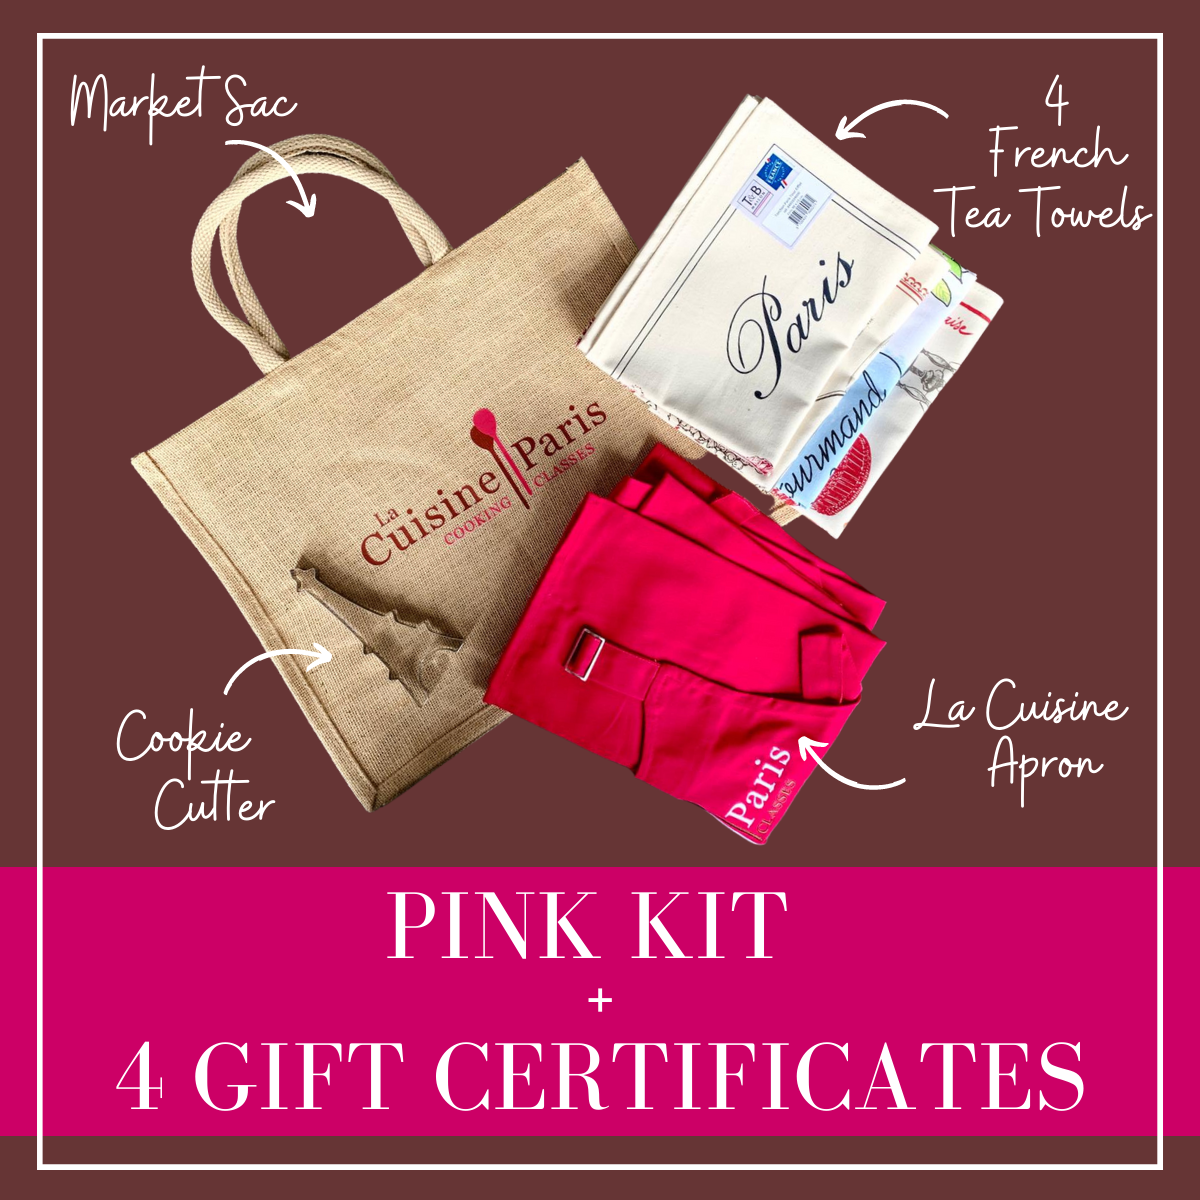 Pink La Cuisine Paris Kit + 4 Video Gift Certificate